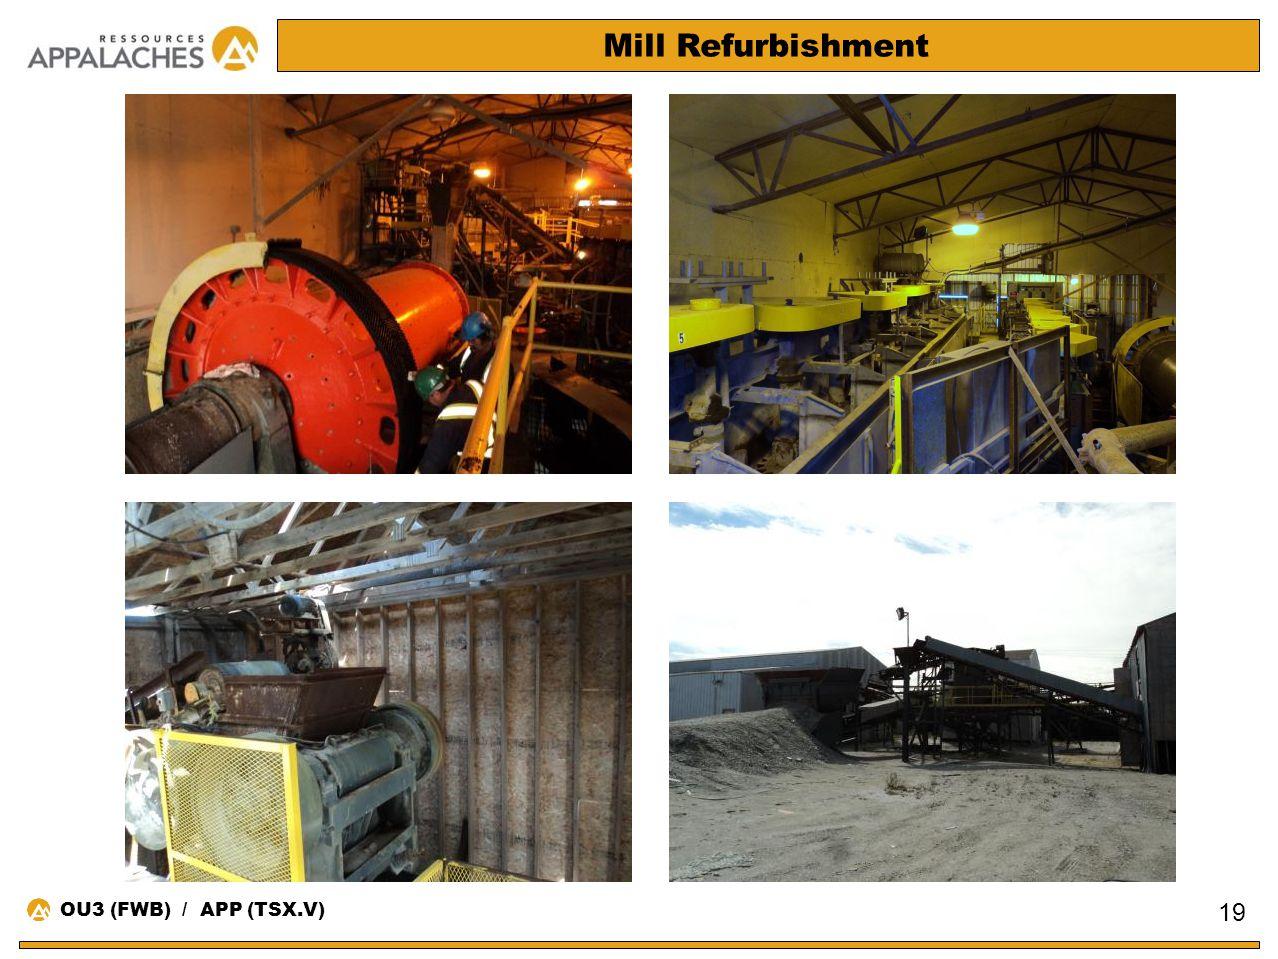 Mill Refurbishment 19 OU3 (FWB) / APP (TSX.V)